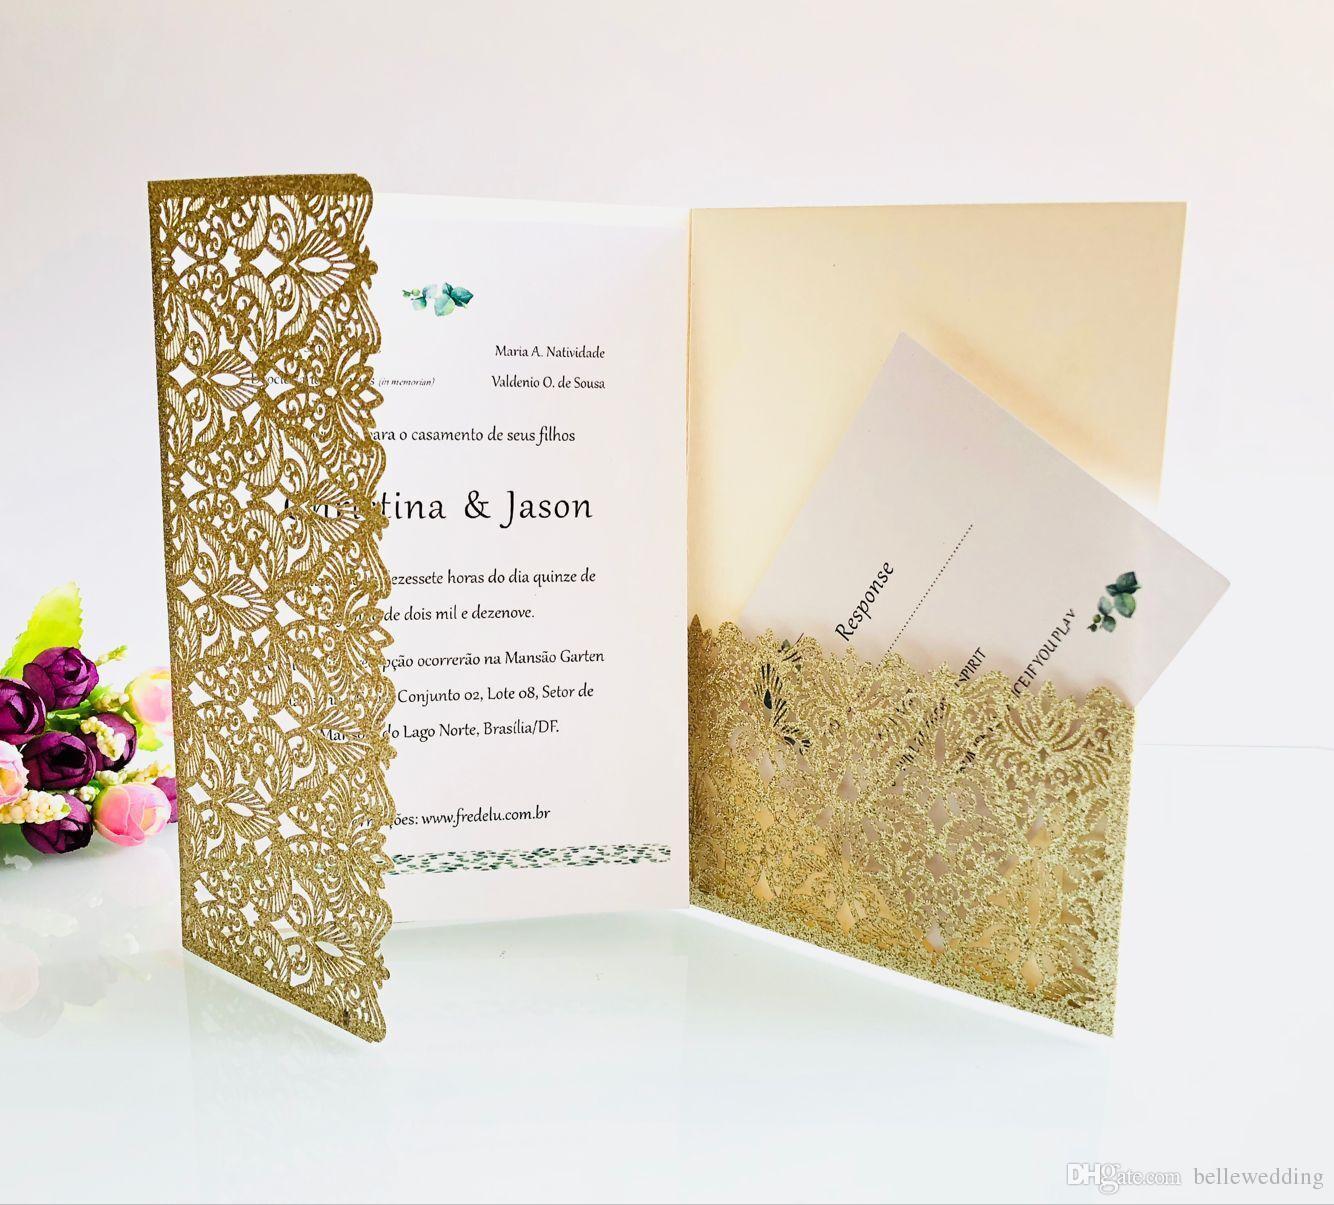 Folded Silver Wedding Invitation Card Online Shopping | Buy Folded Silver Wedding  Invitation Card at DHgate.com